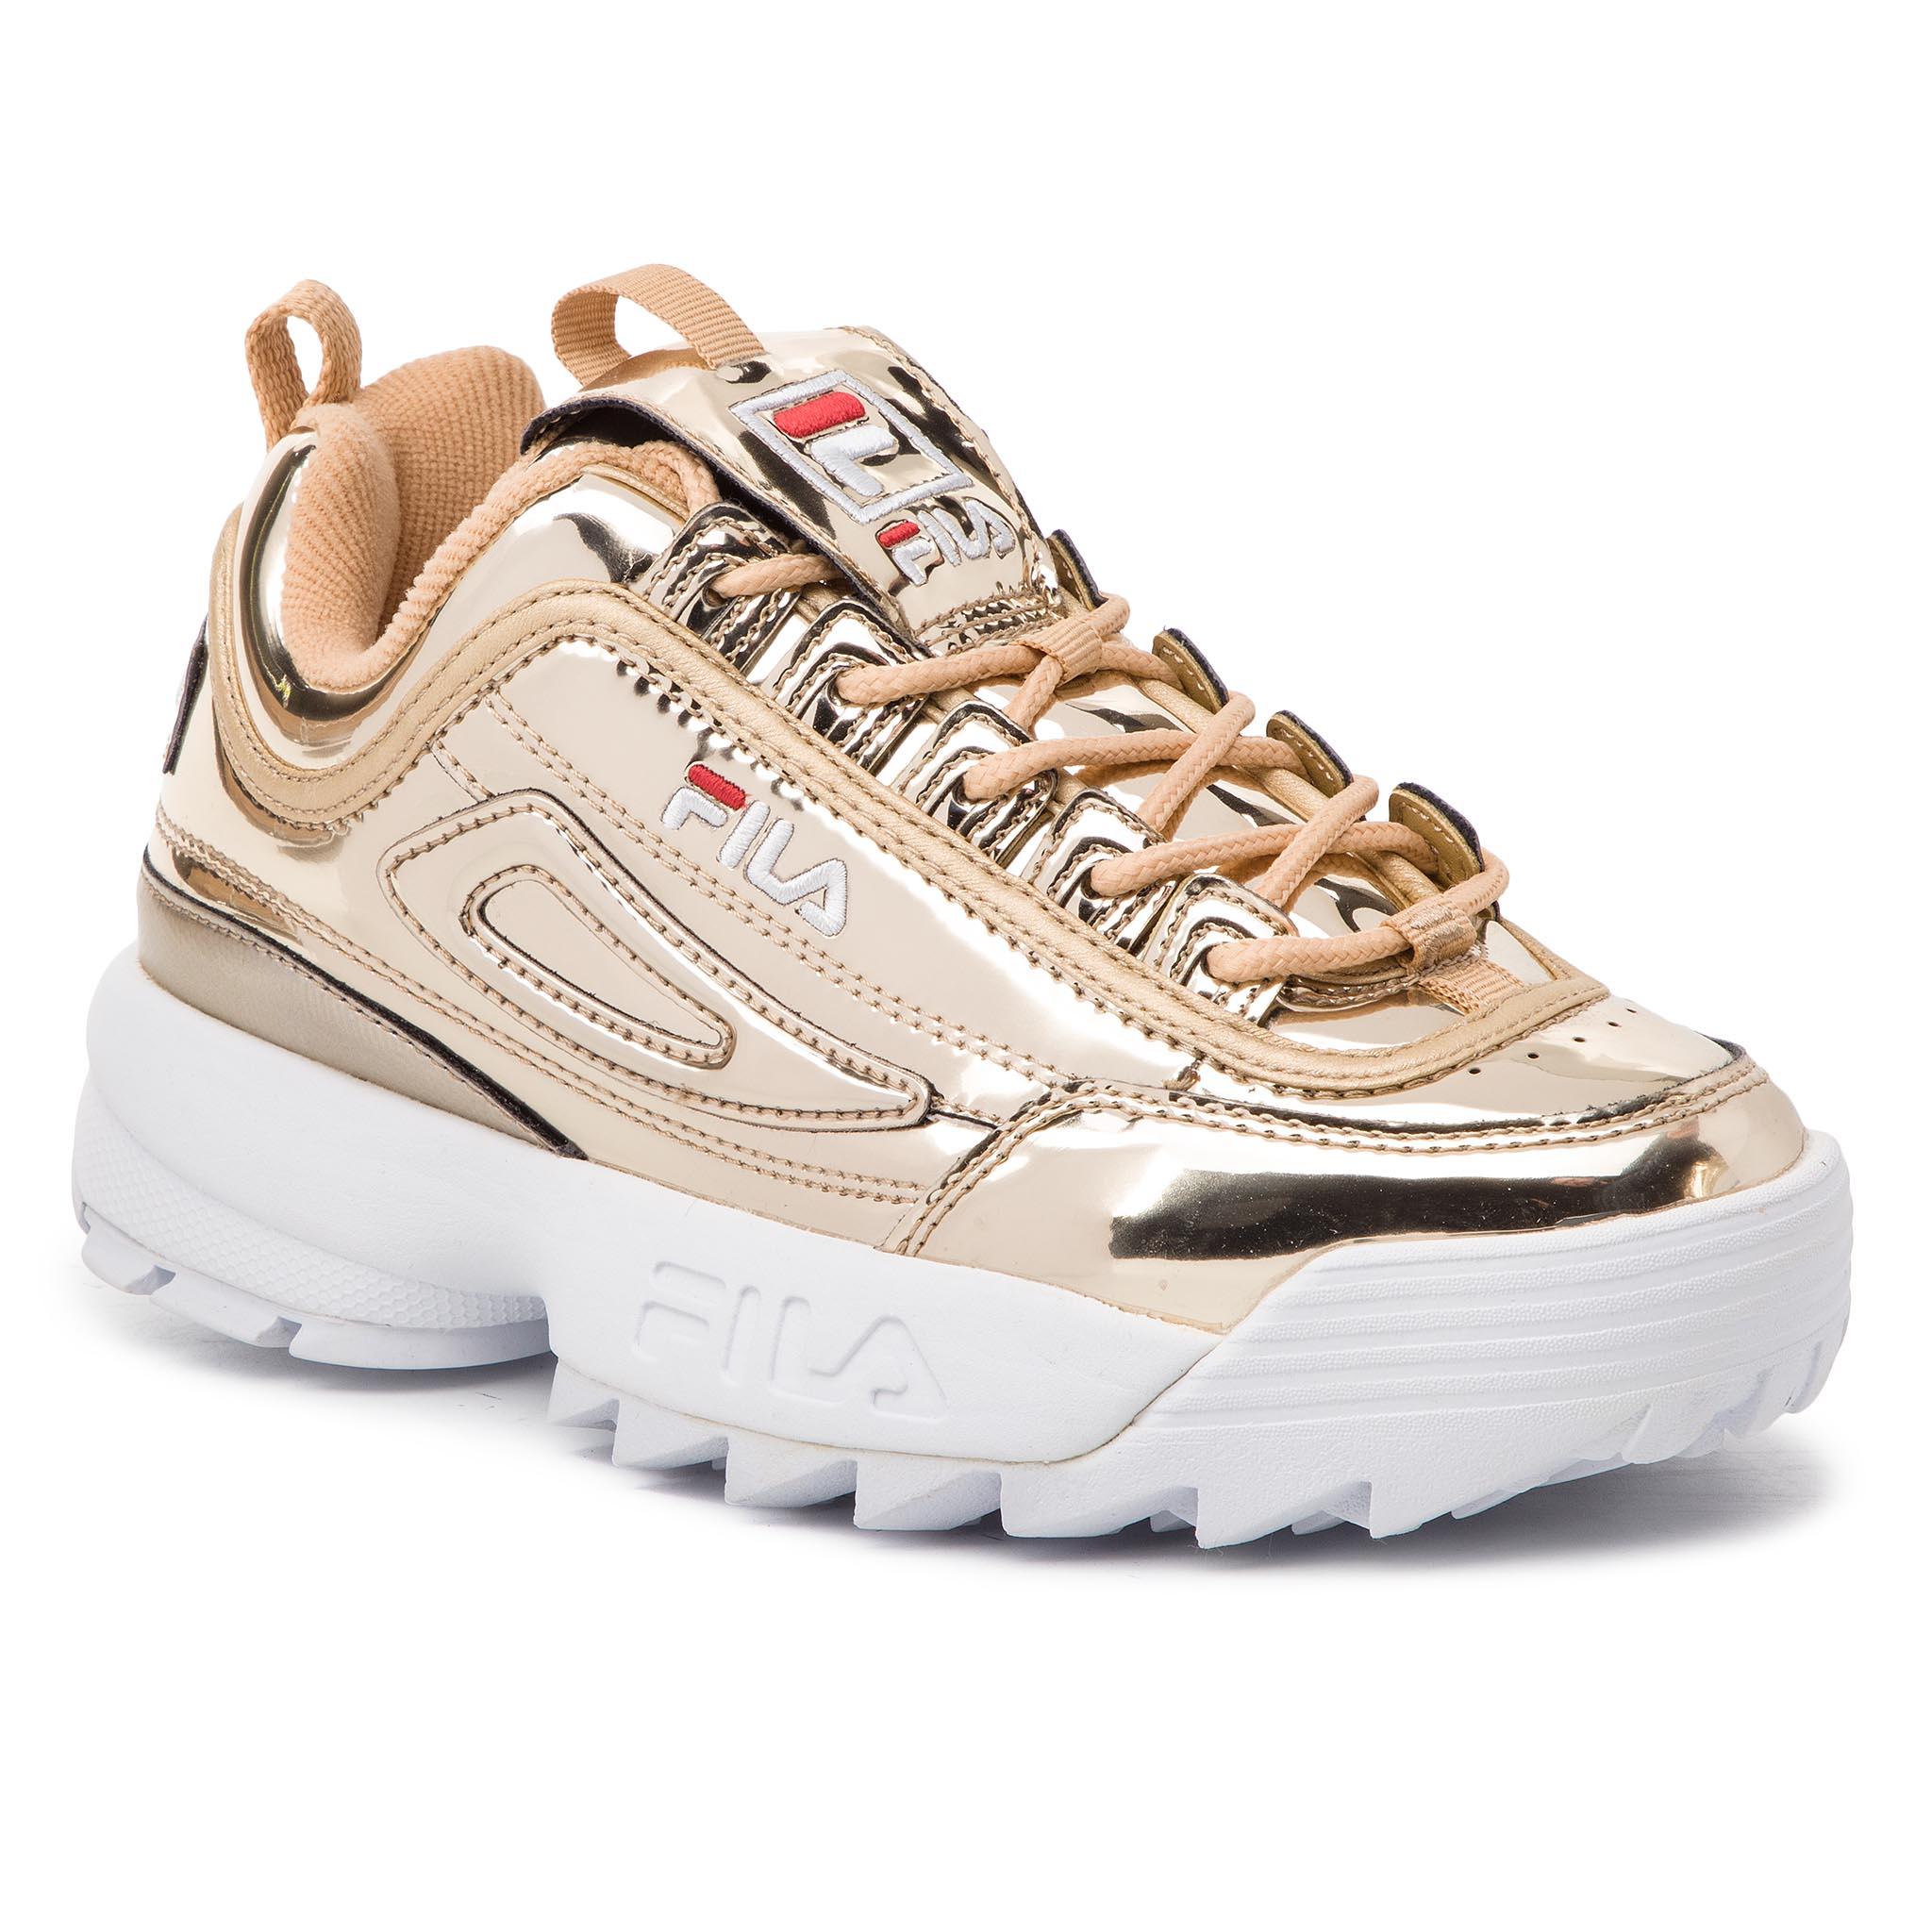 d34d4f4eff2 Sneakers FILA - Disruptor M Low Wmn 1010608.25Y Black - Sneakers ...